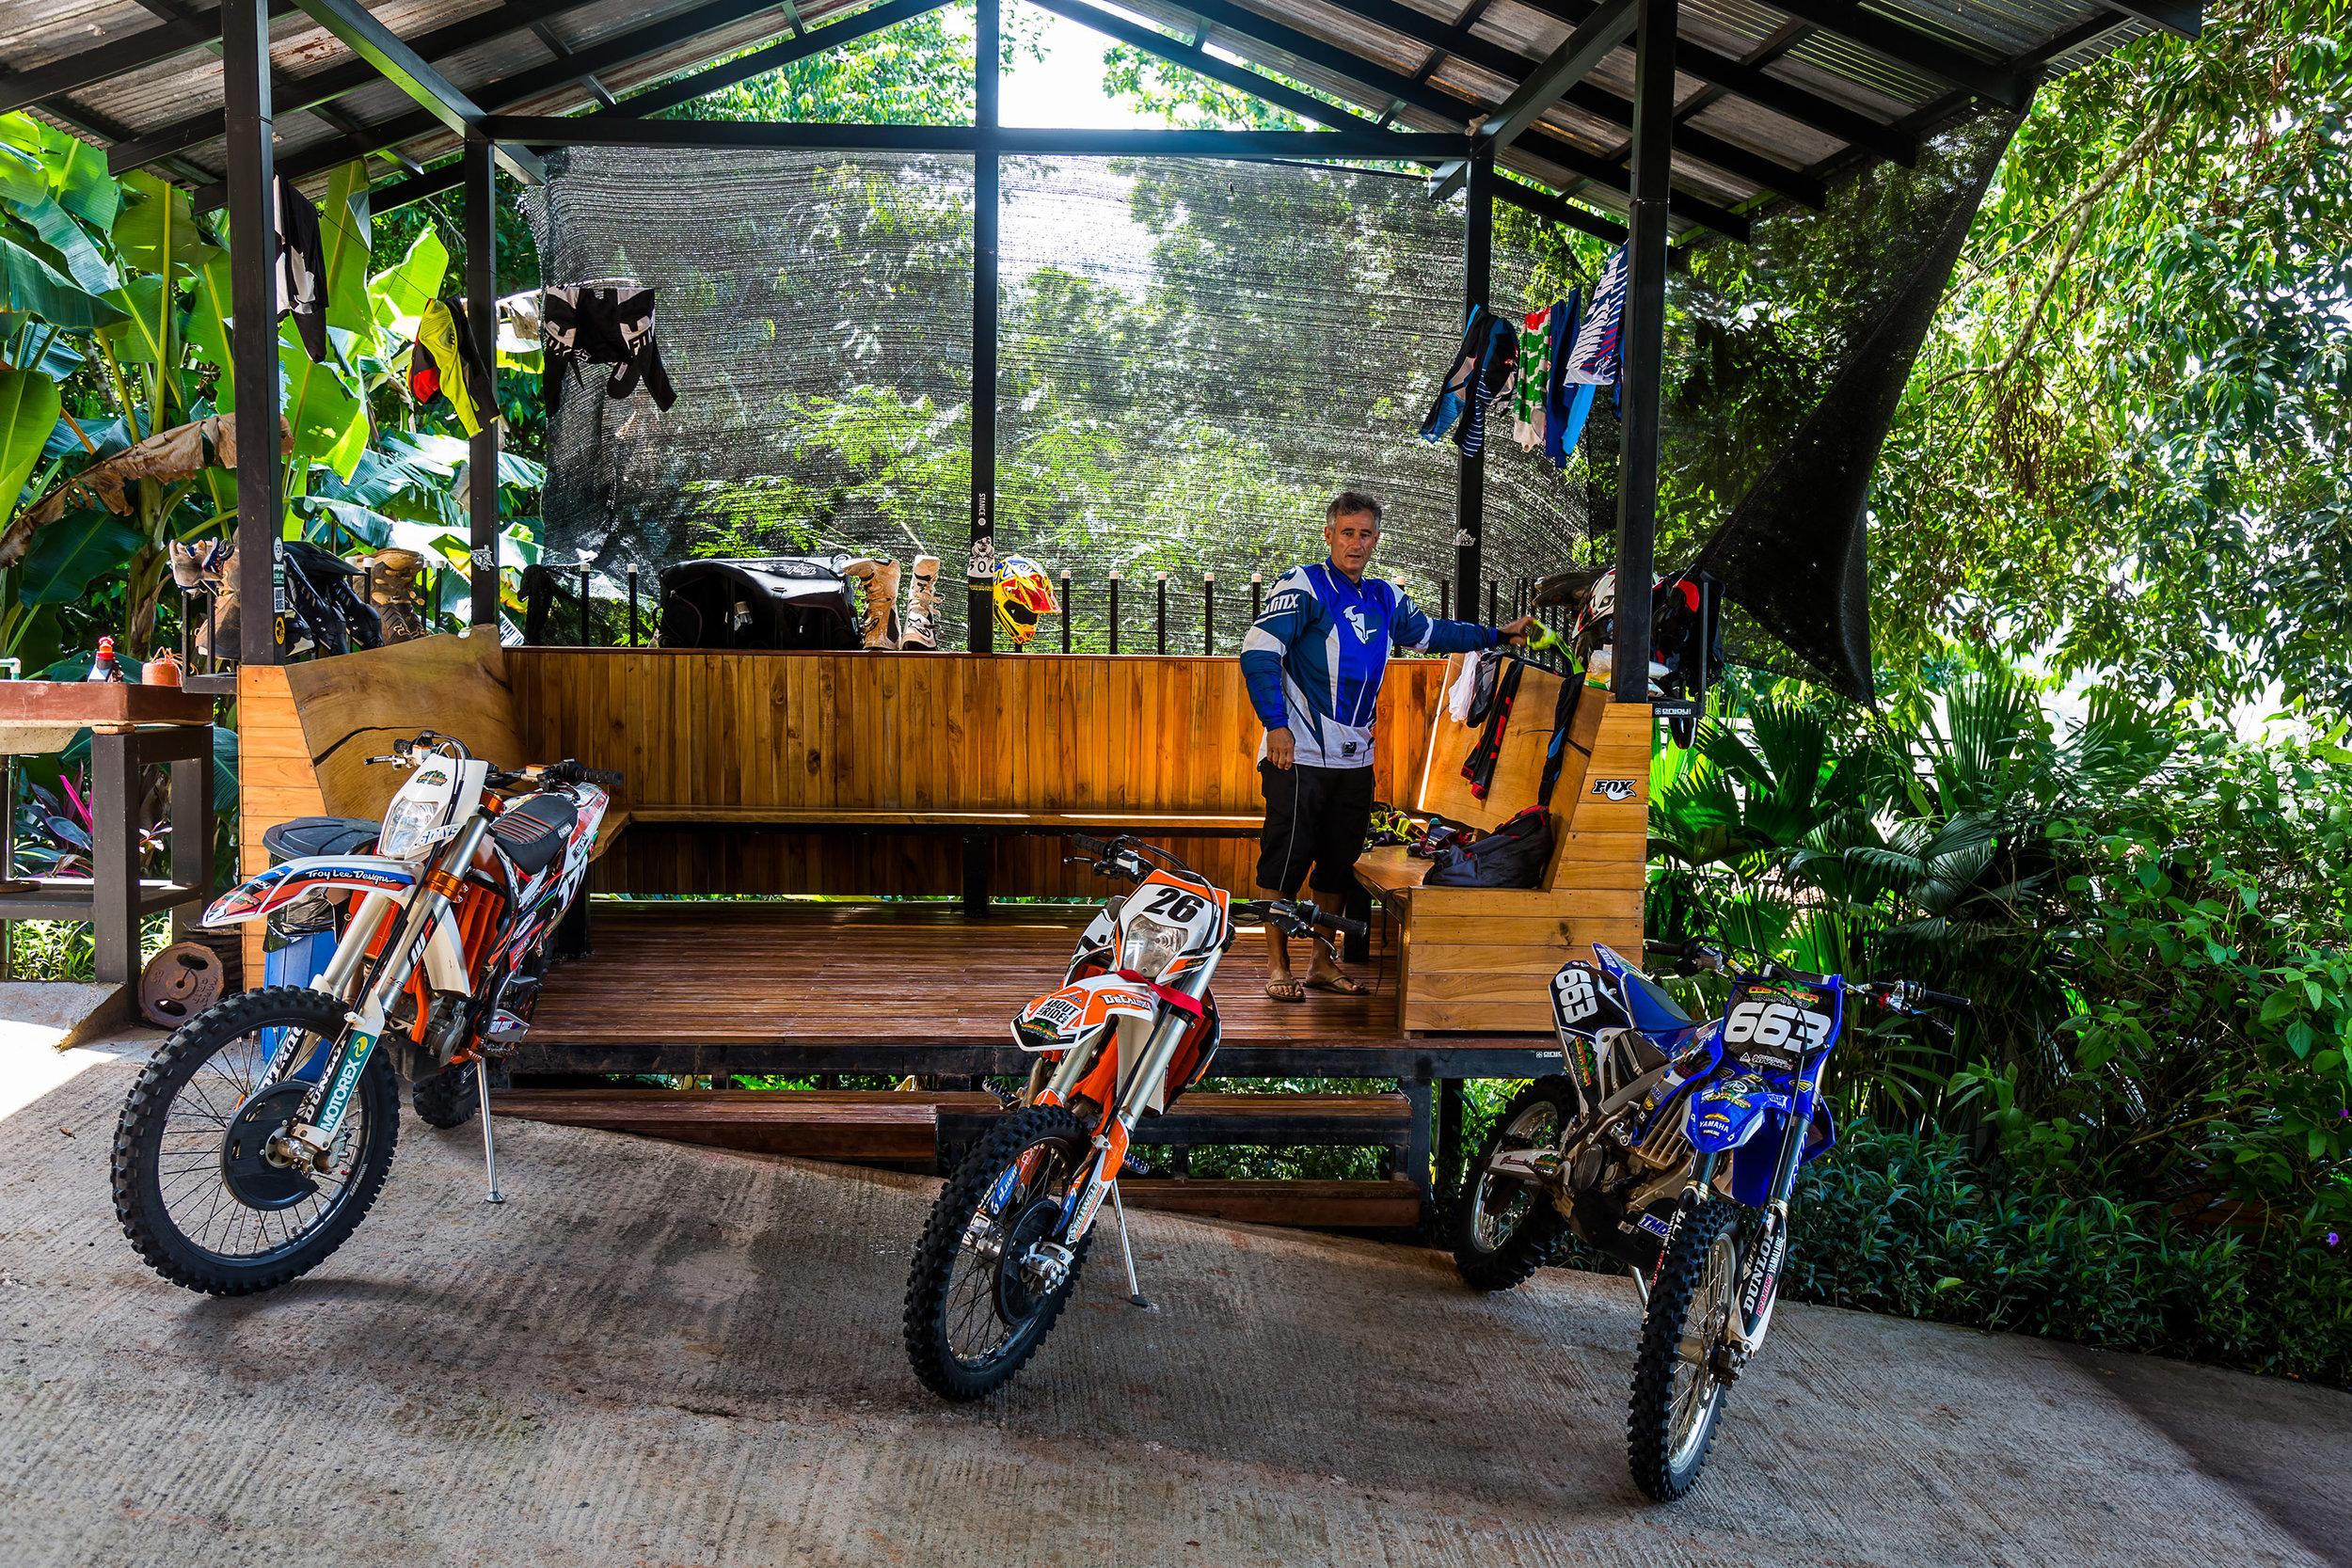 Costa_Rica-ODV_5672.jpg